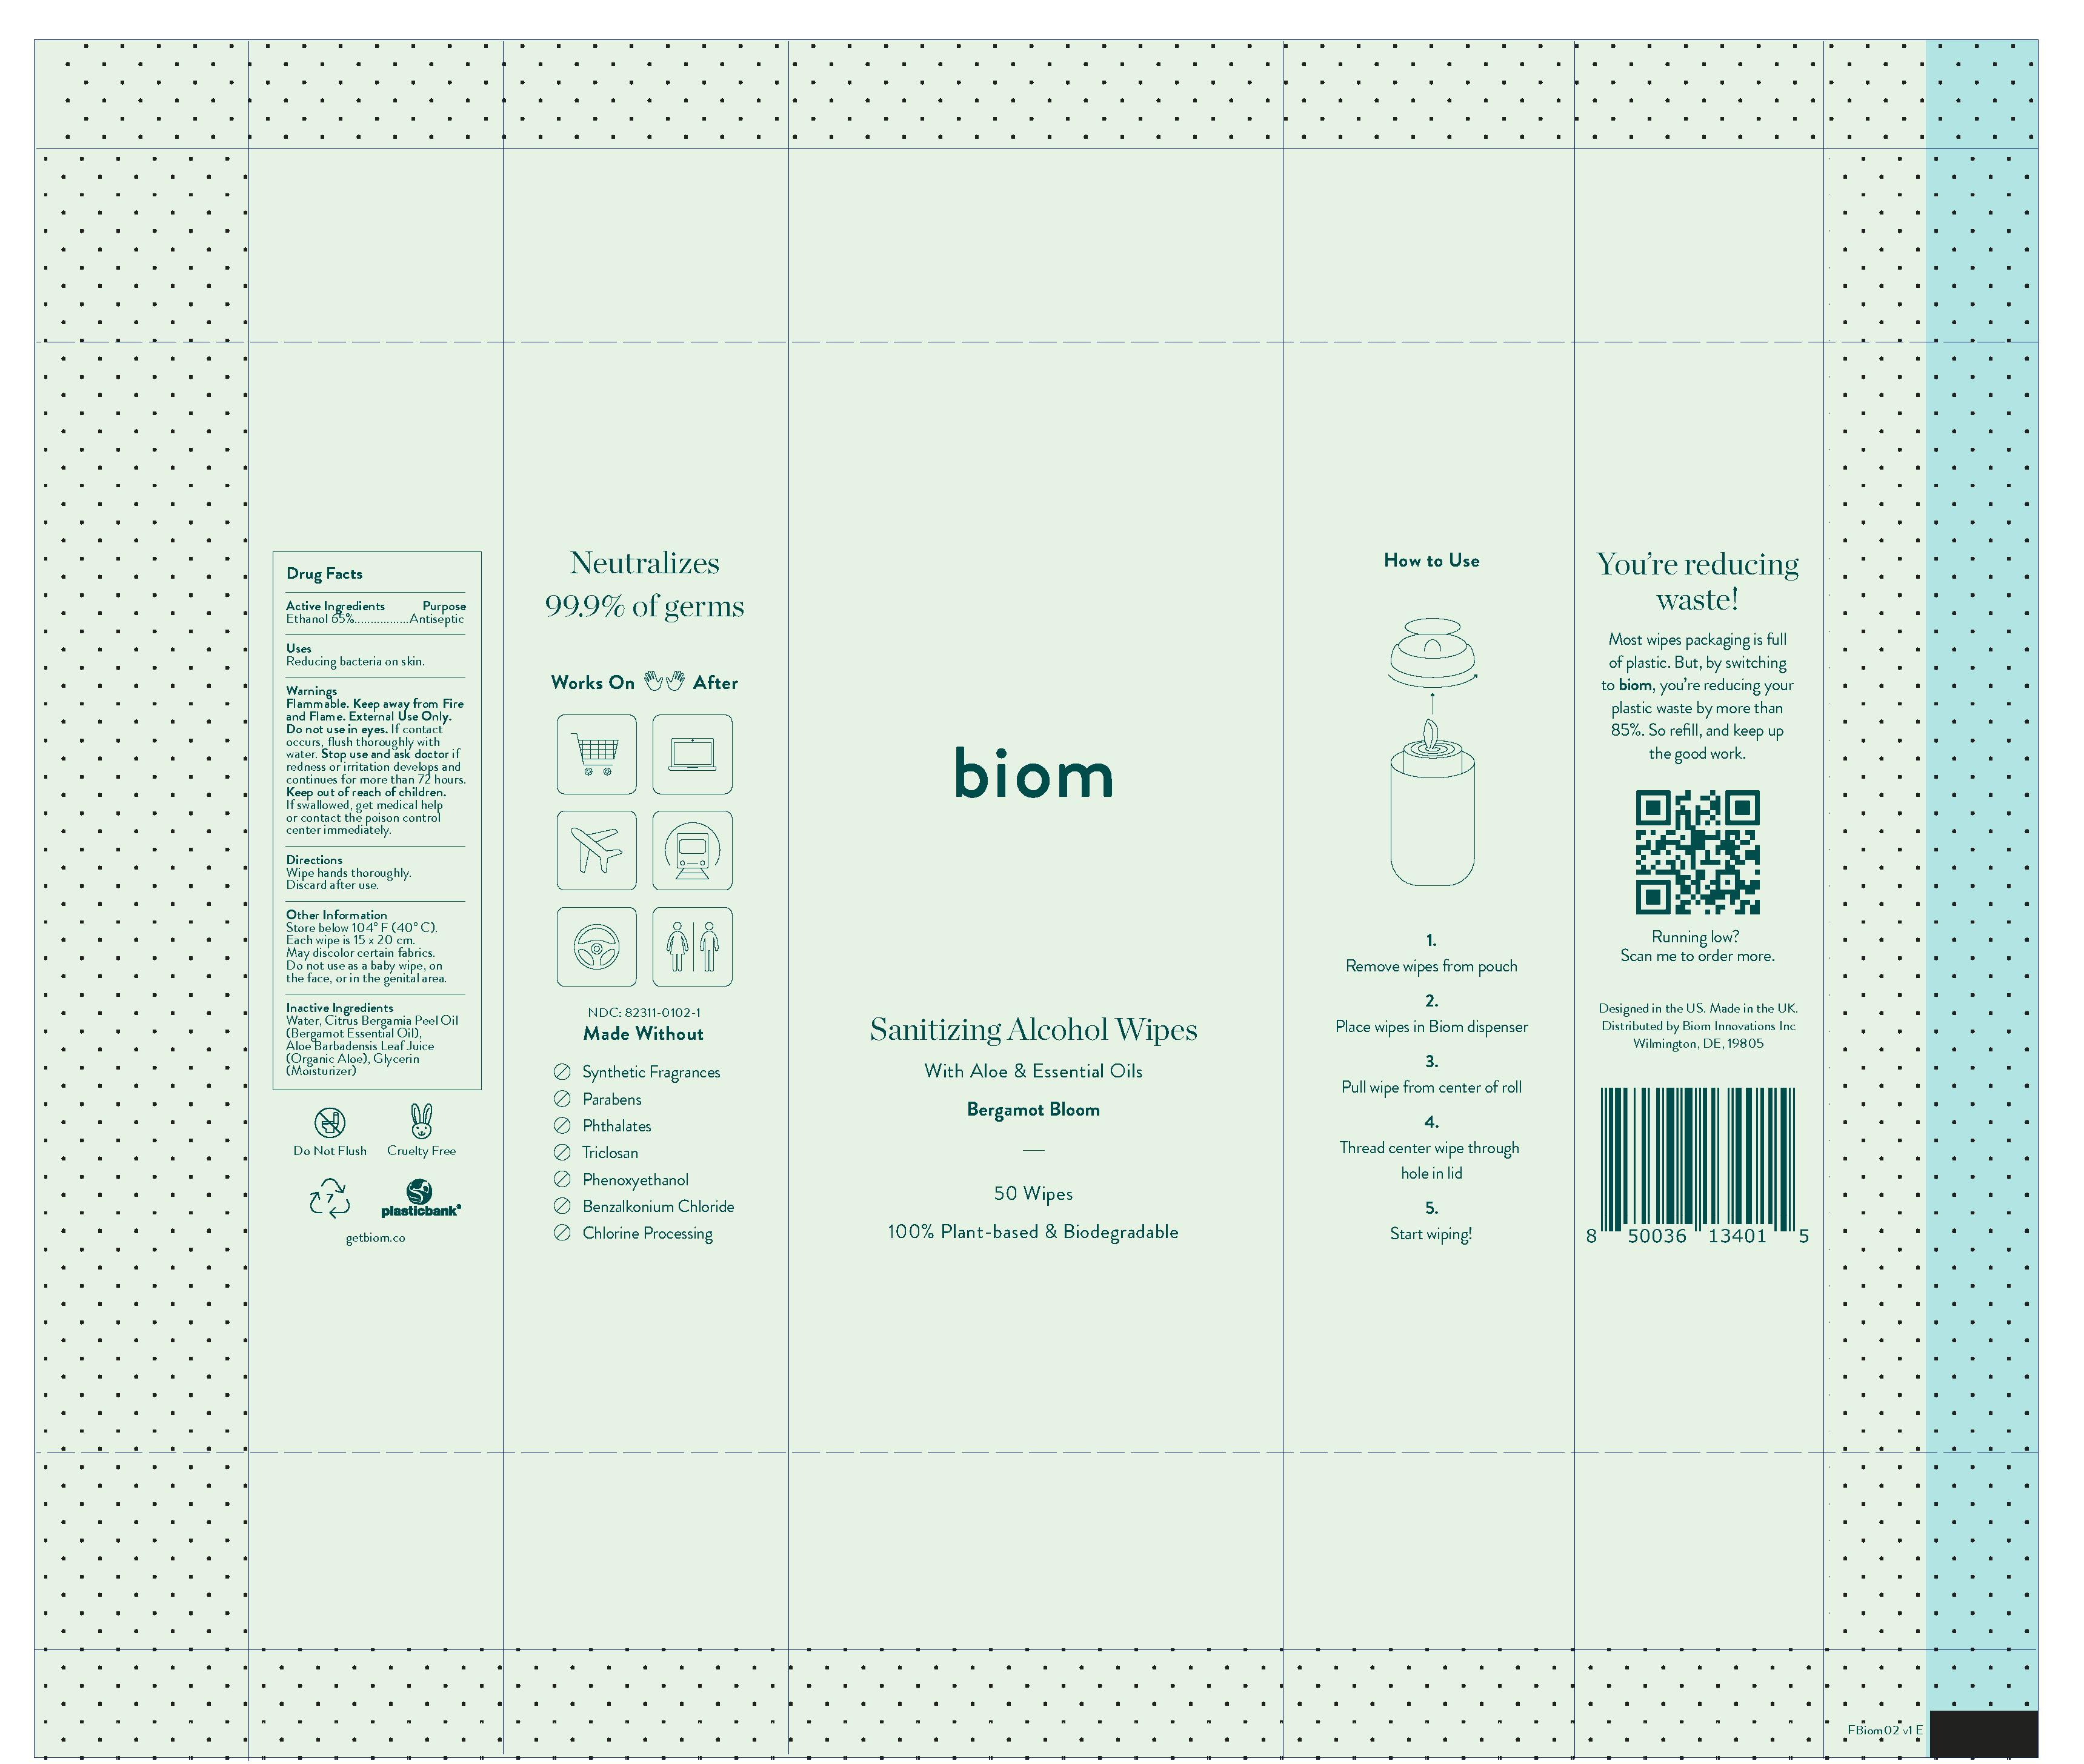 BIOM02 Bergamot Bloom - sanitising alcohol wipes